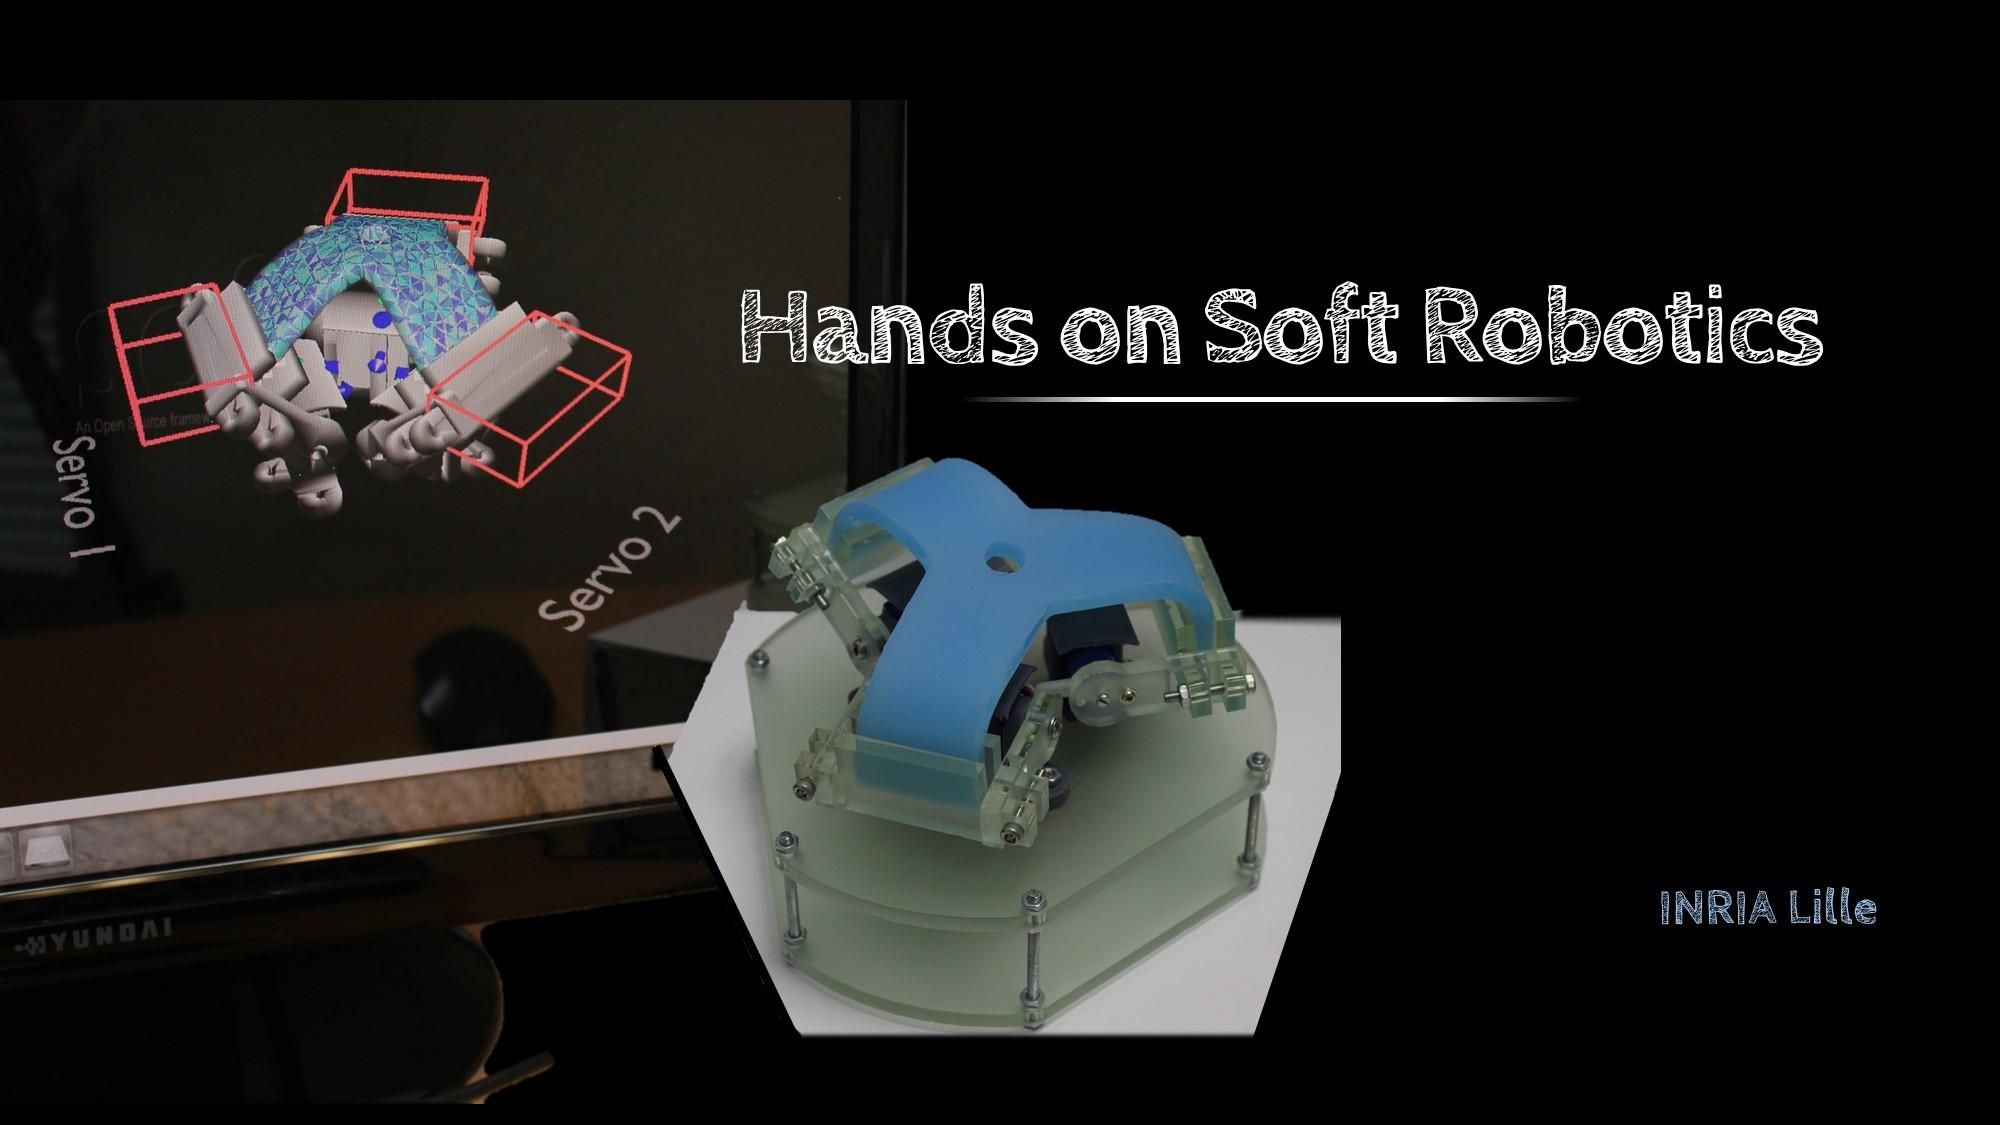 Hands on Soft Robotics